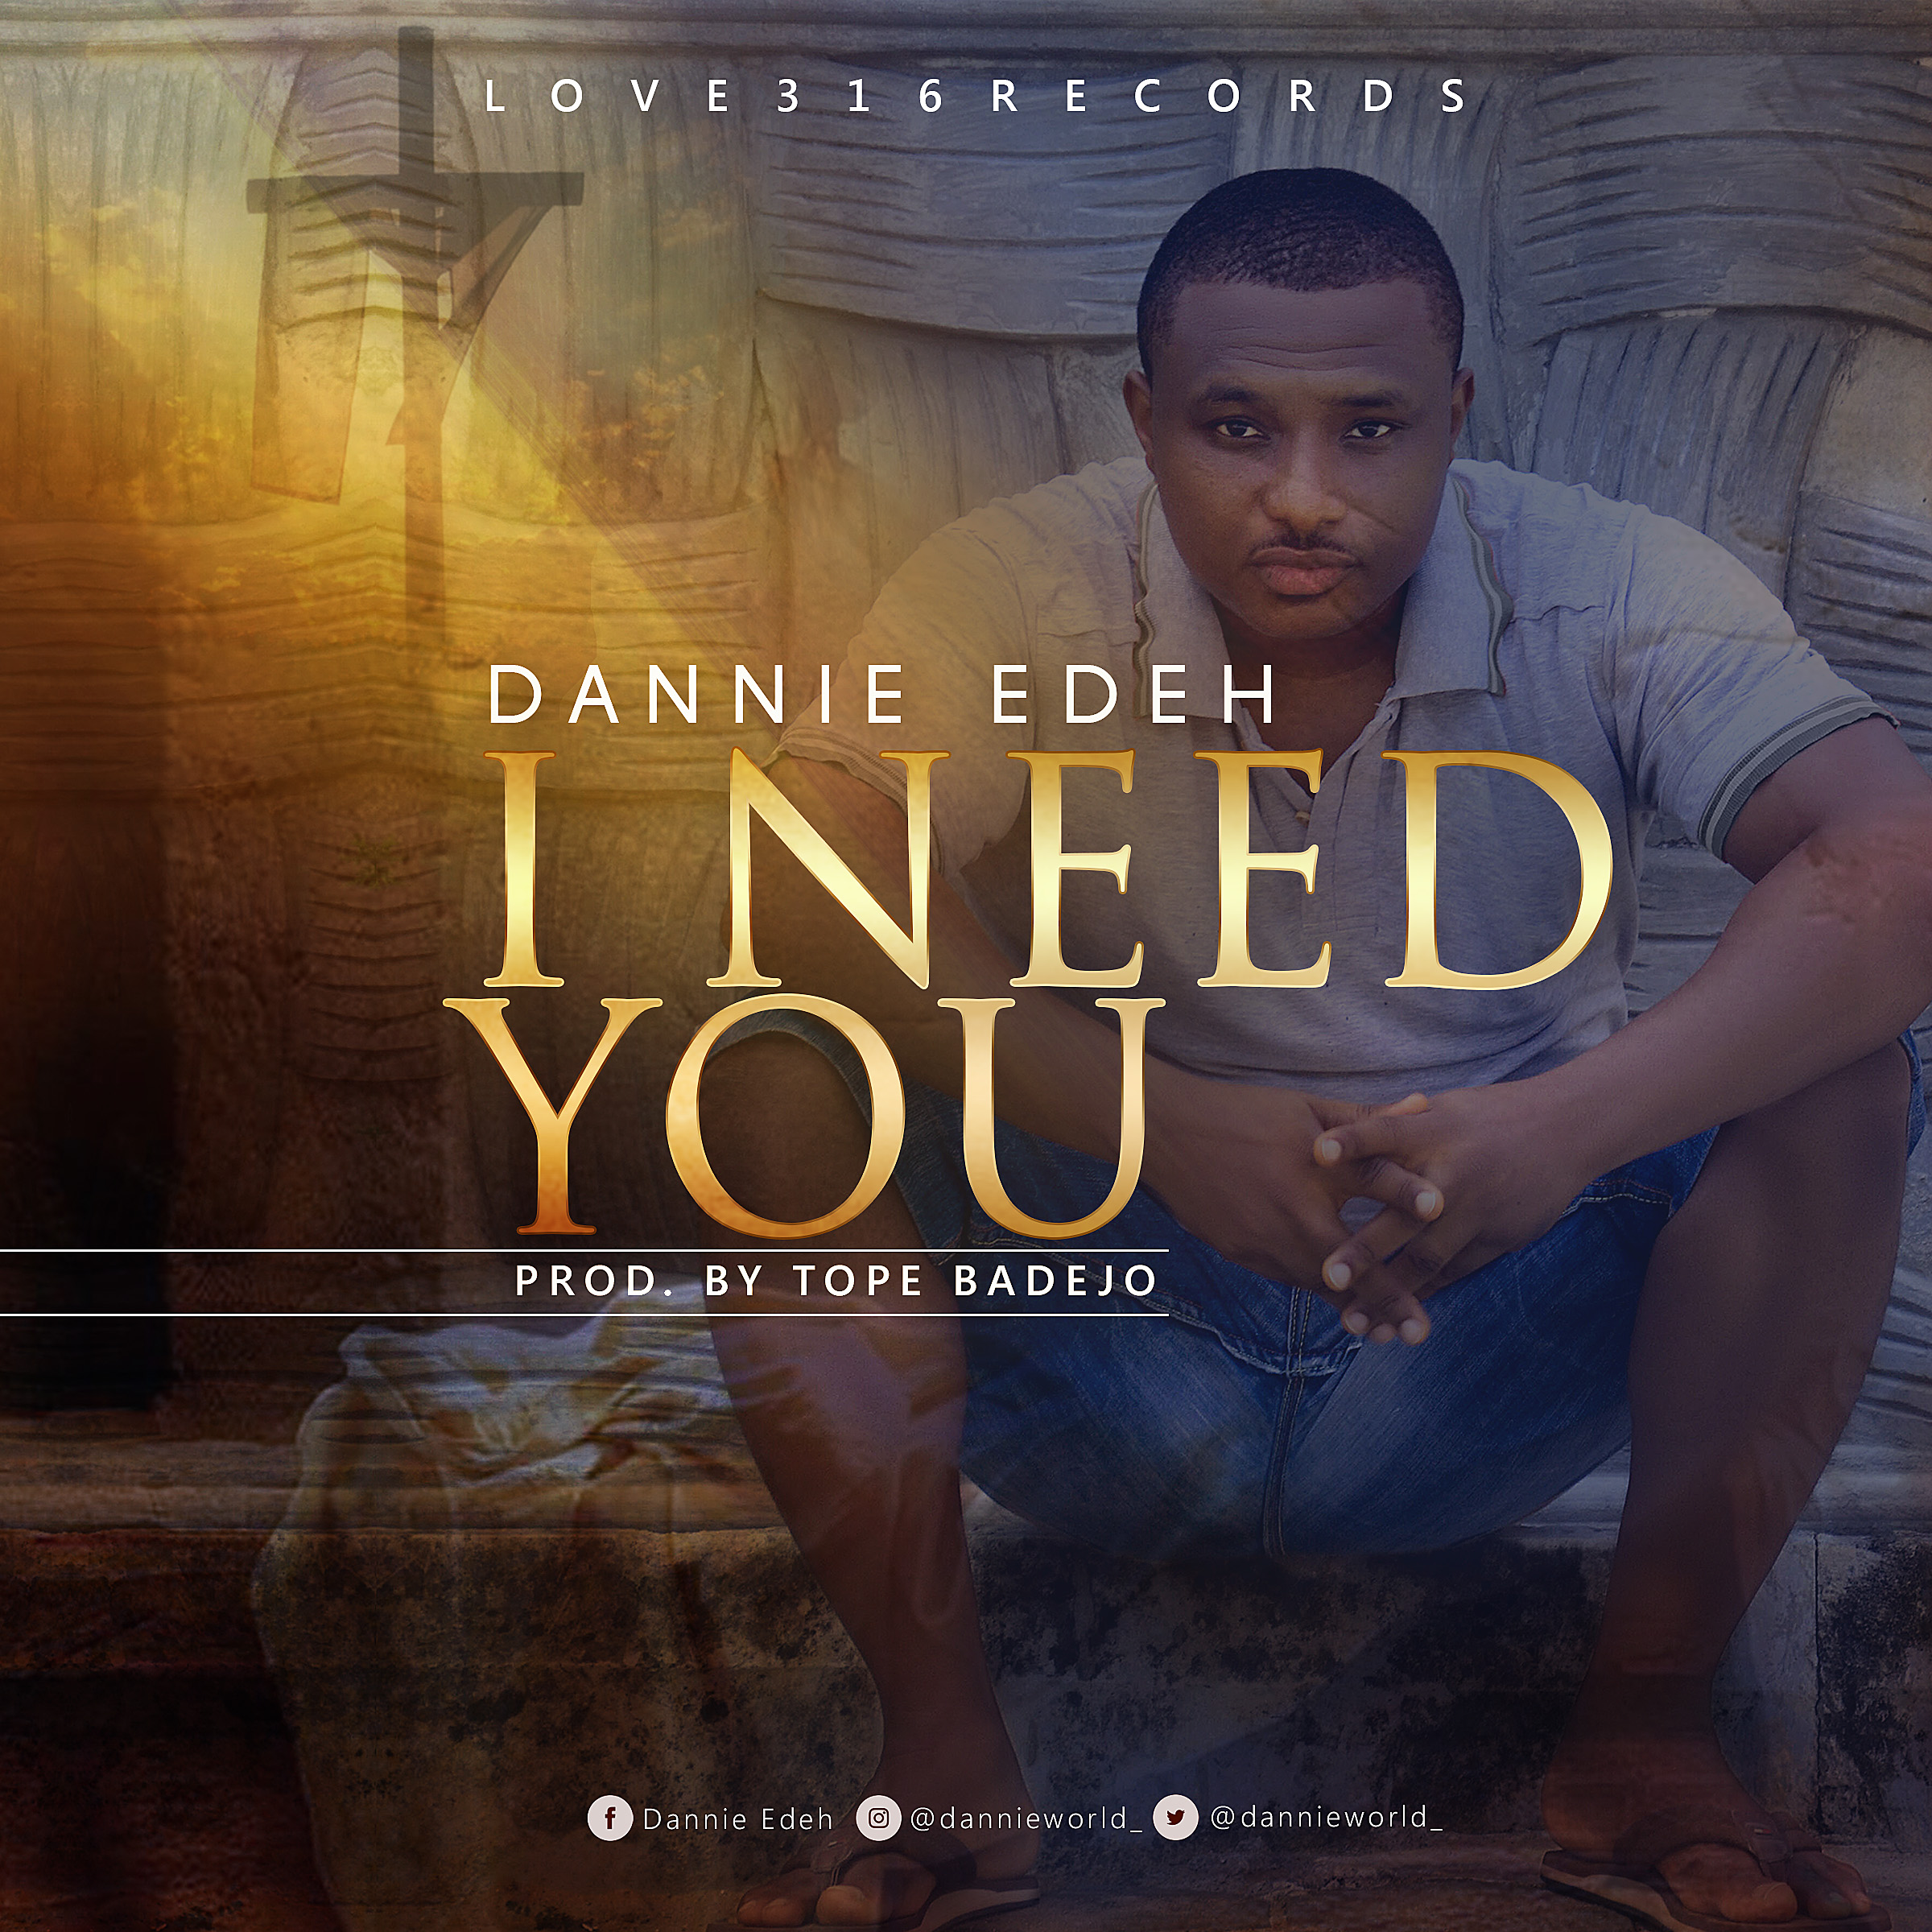 Dannie Edeh - I Need You